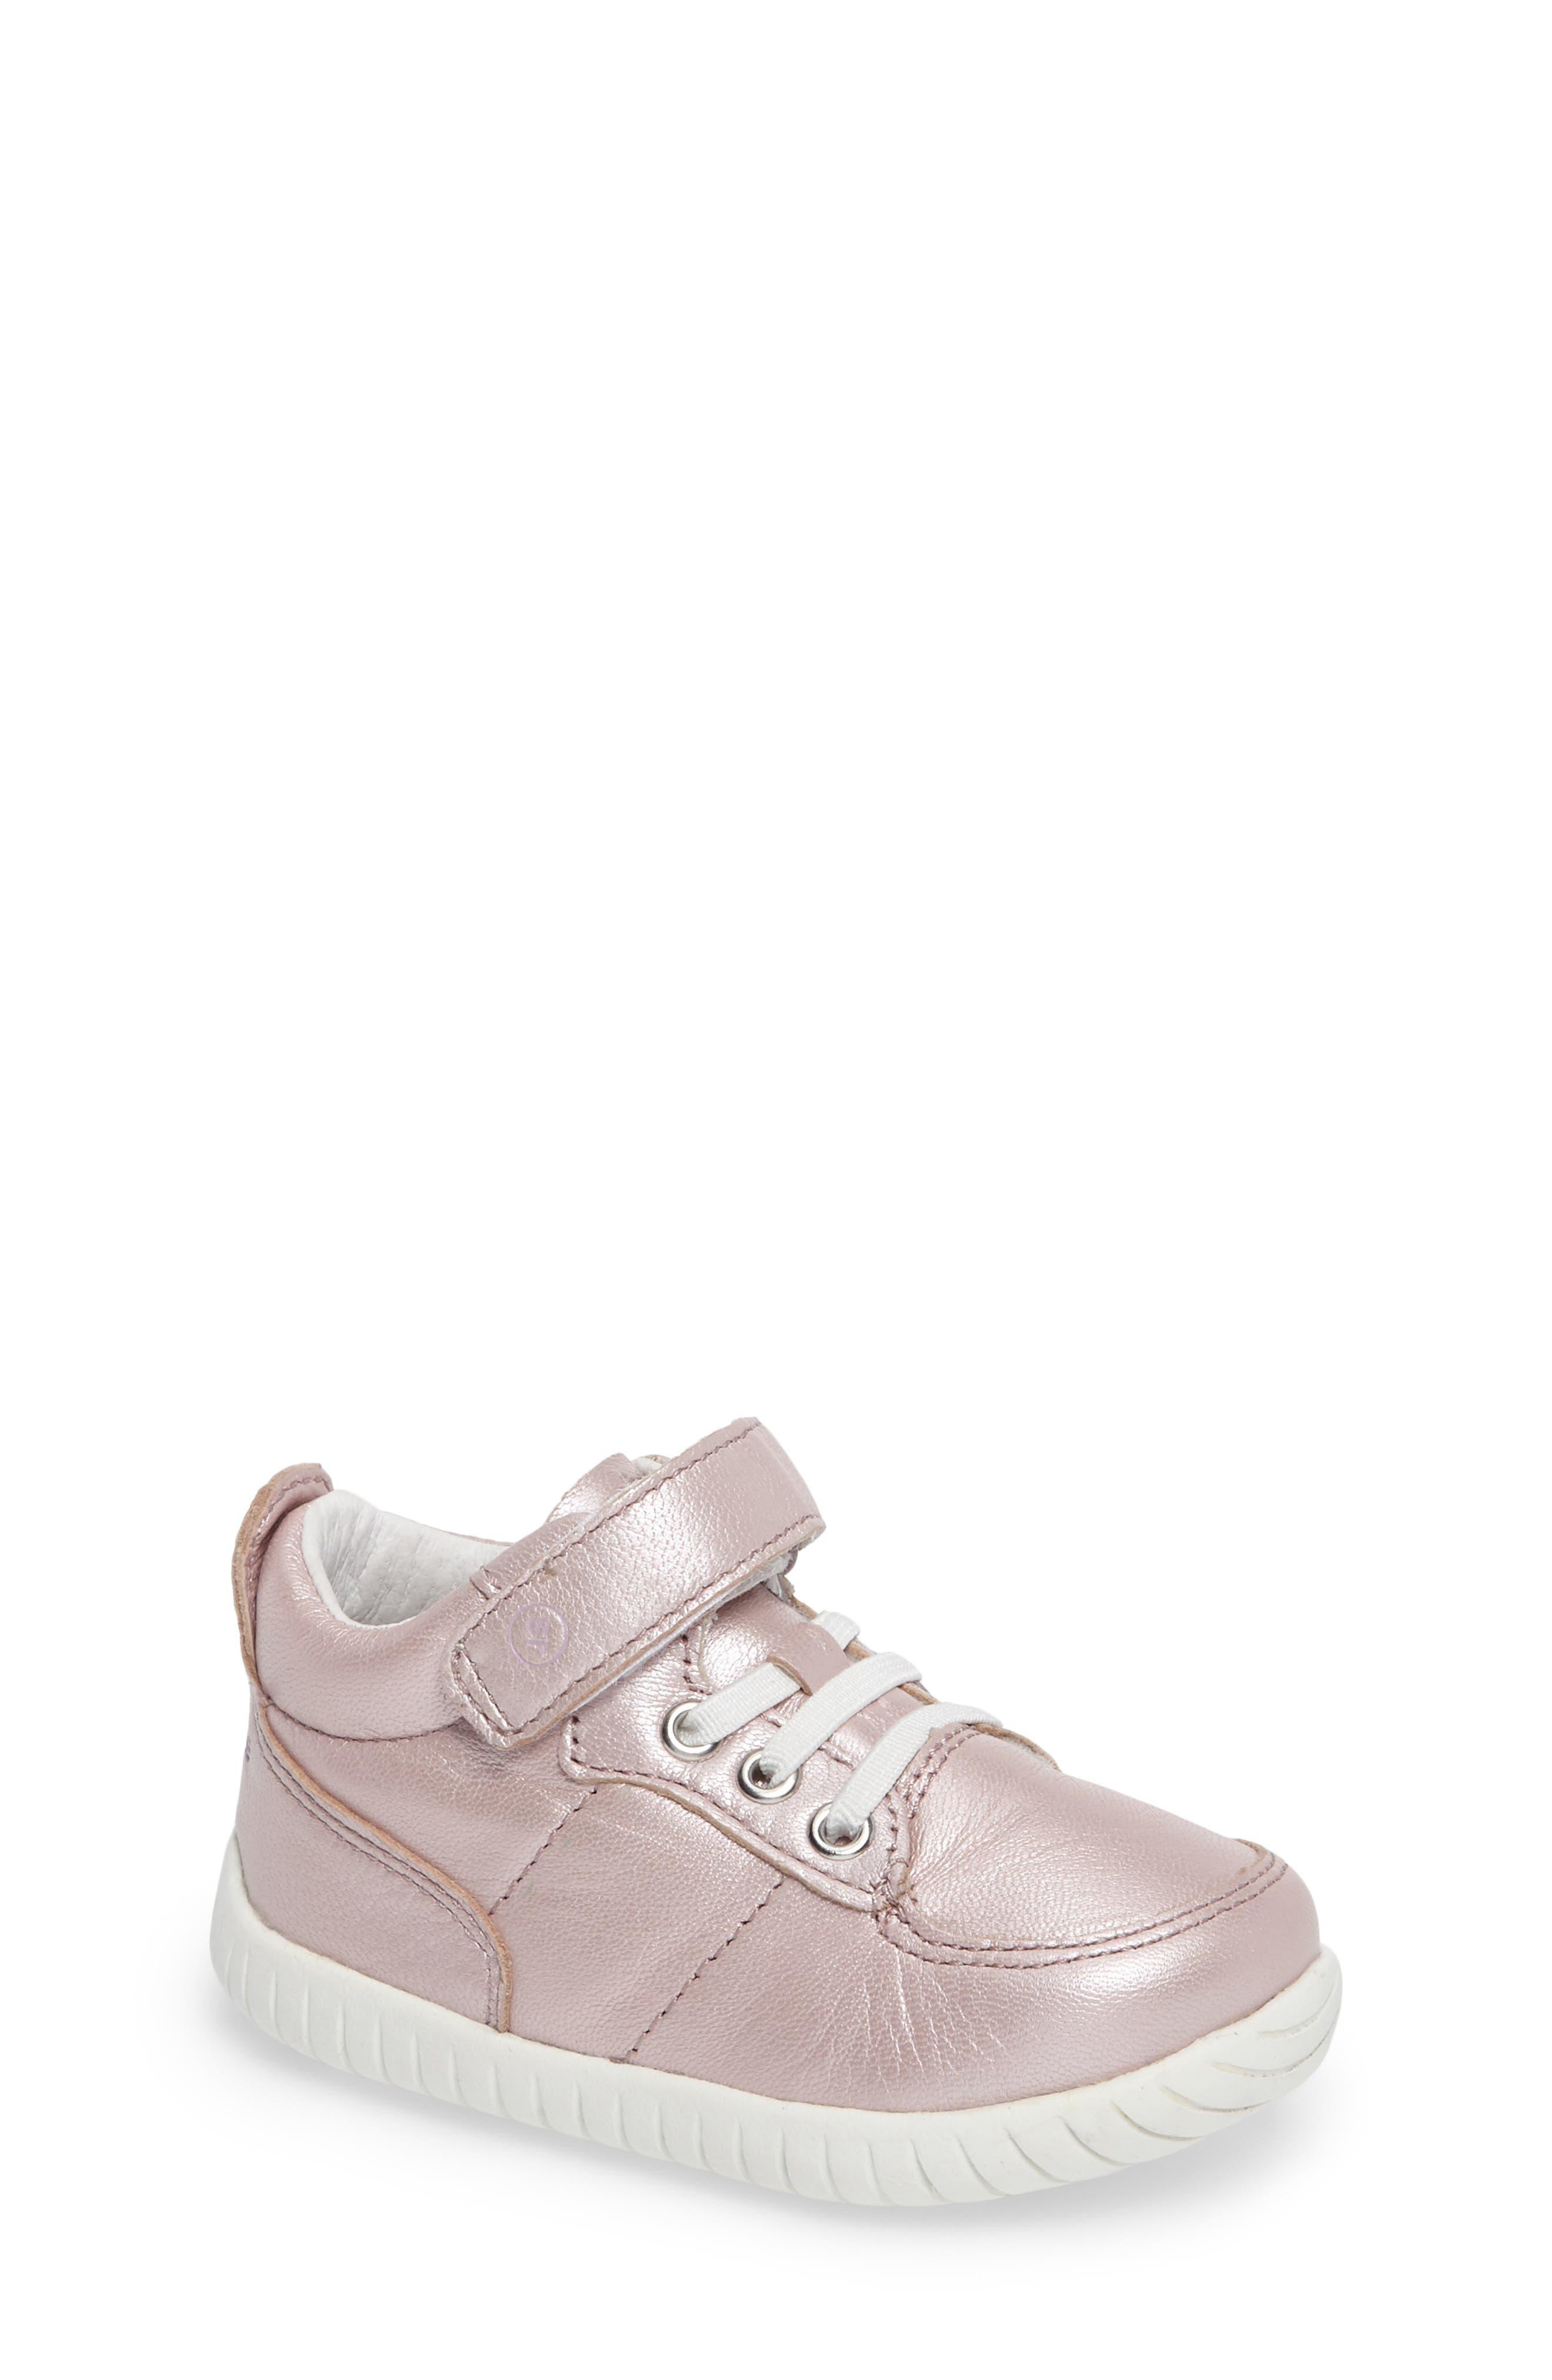 Bailey High Top Sneaker,                             Main thumbnail 1, color,                             Pink Metallic